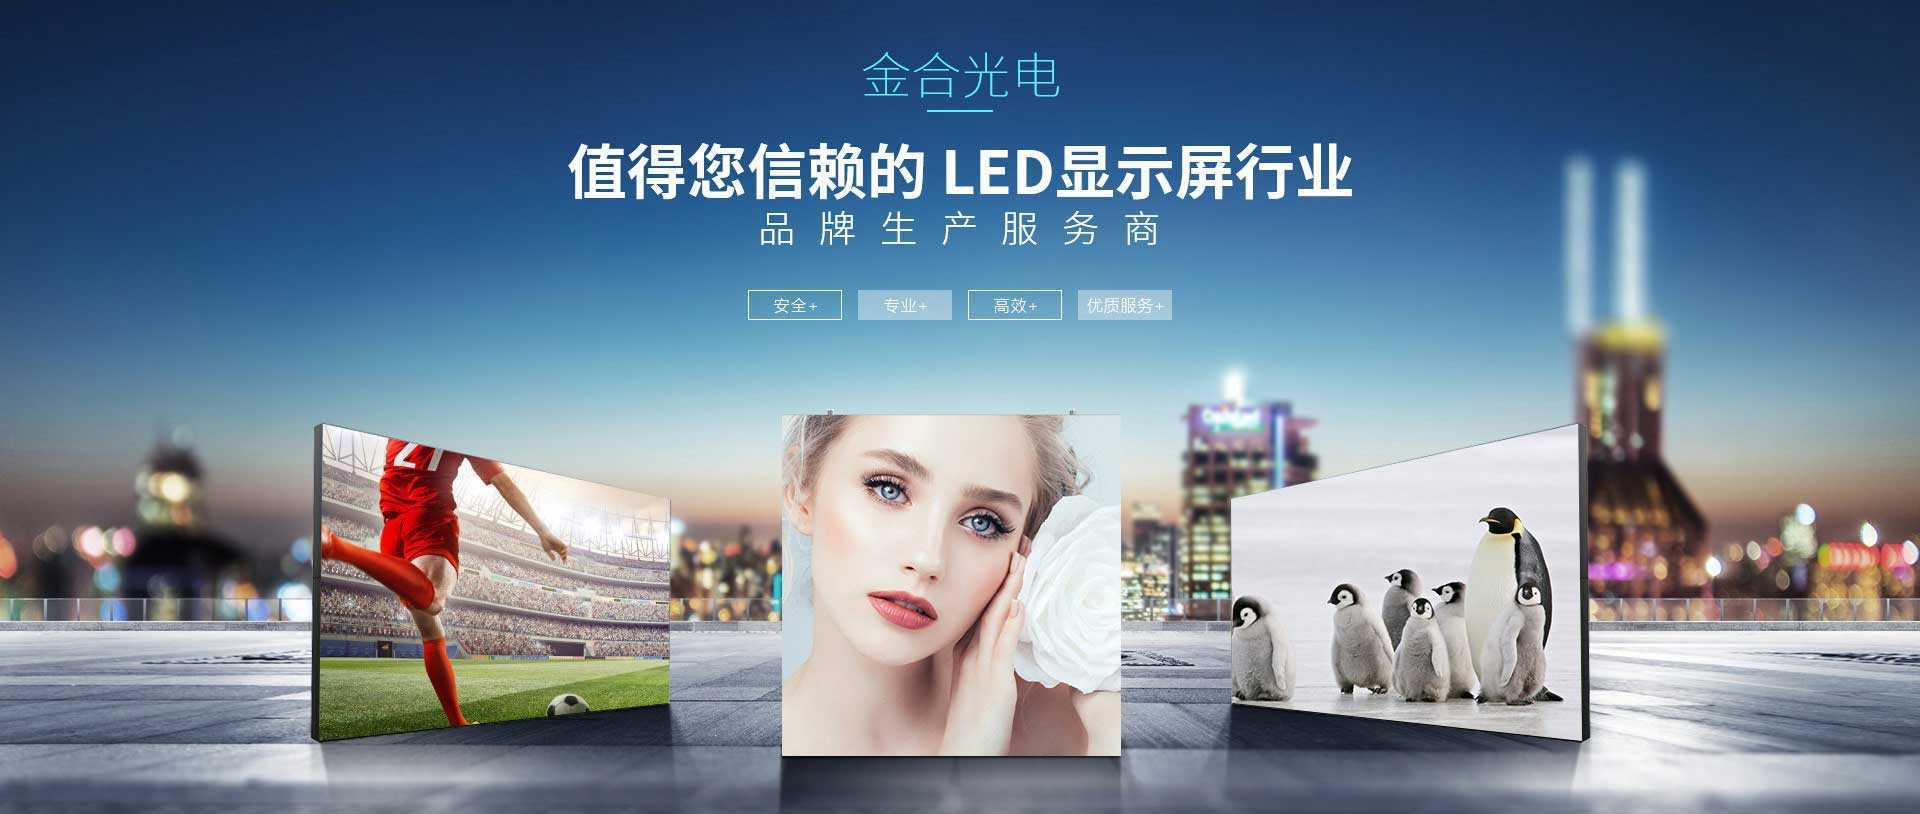 LED显示屏-高清全彩LED显示屏-深圳LED电子显示屏生产厂家-金合光电